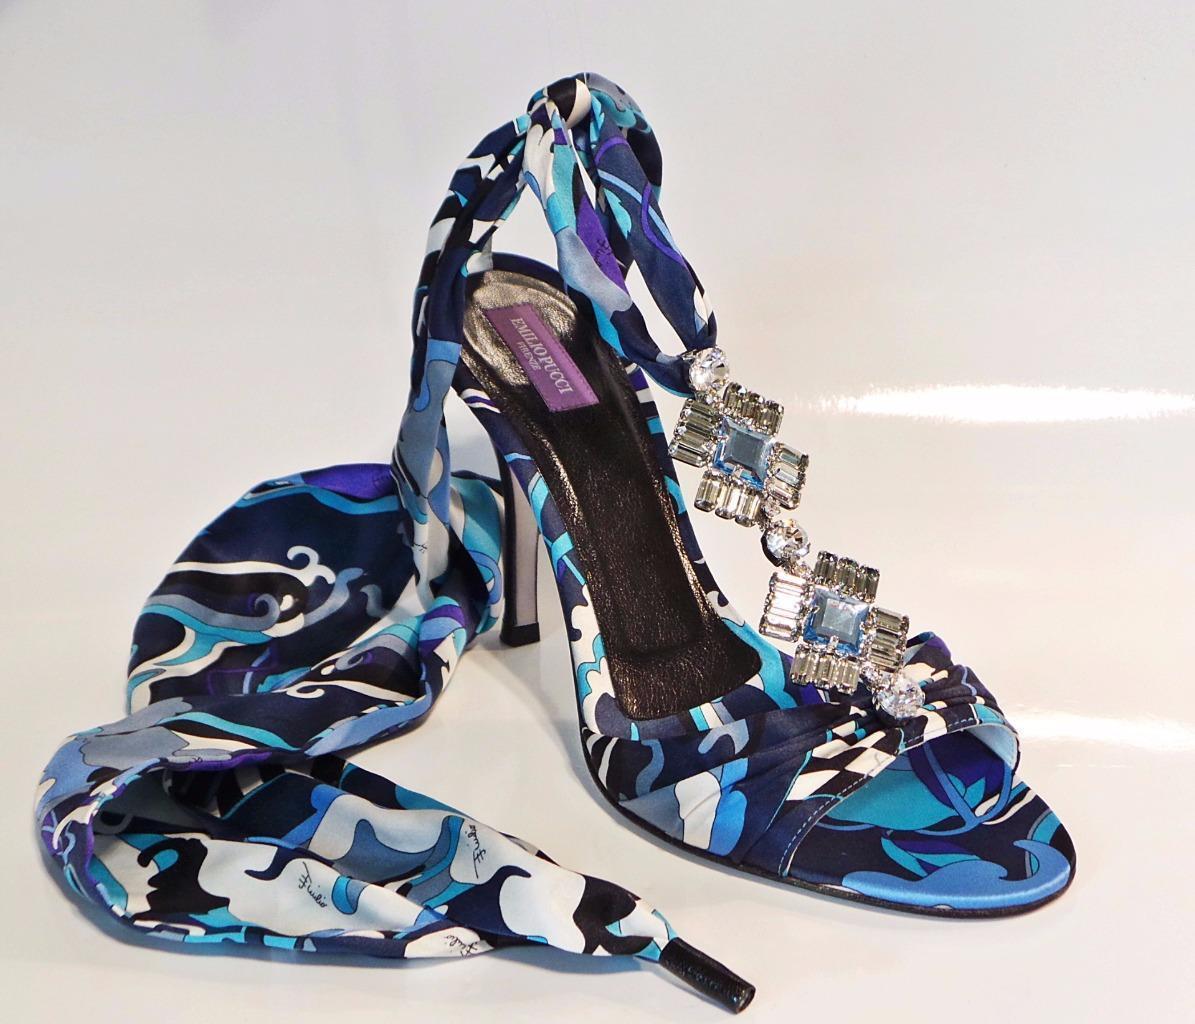 EMILIO PUCCI Blau Print Satin Satin Satin Ankle Wrap Jeweled Sandal Heel schuhe 39.5 NIB b10721